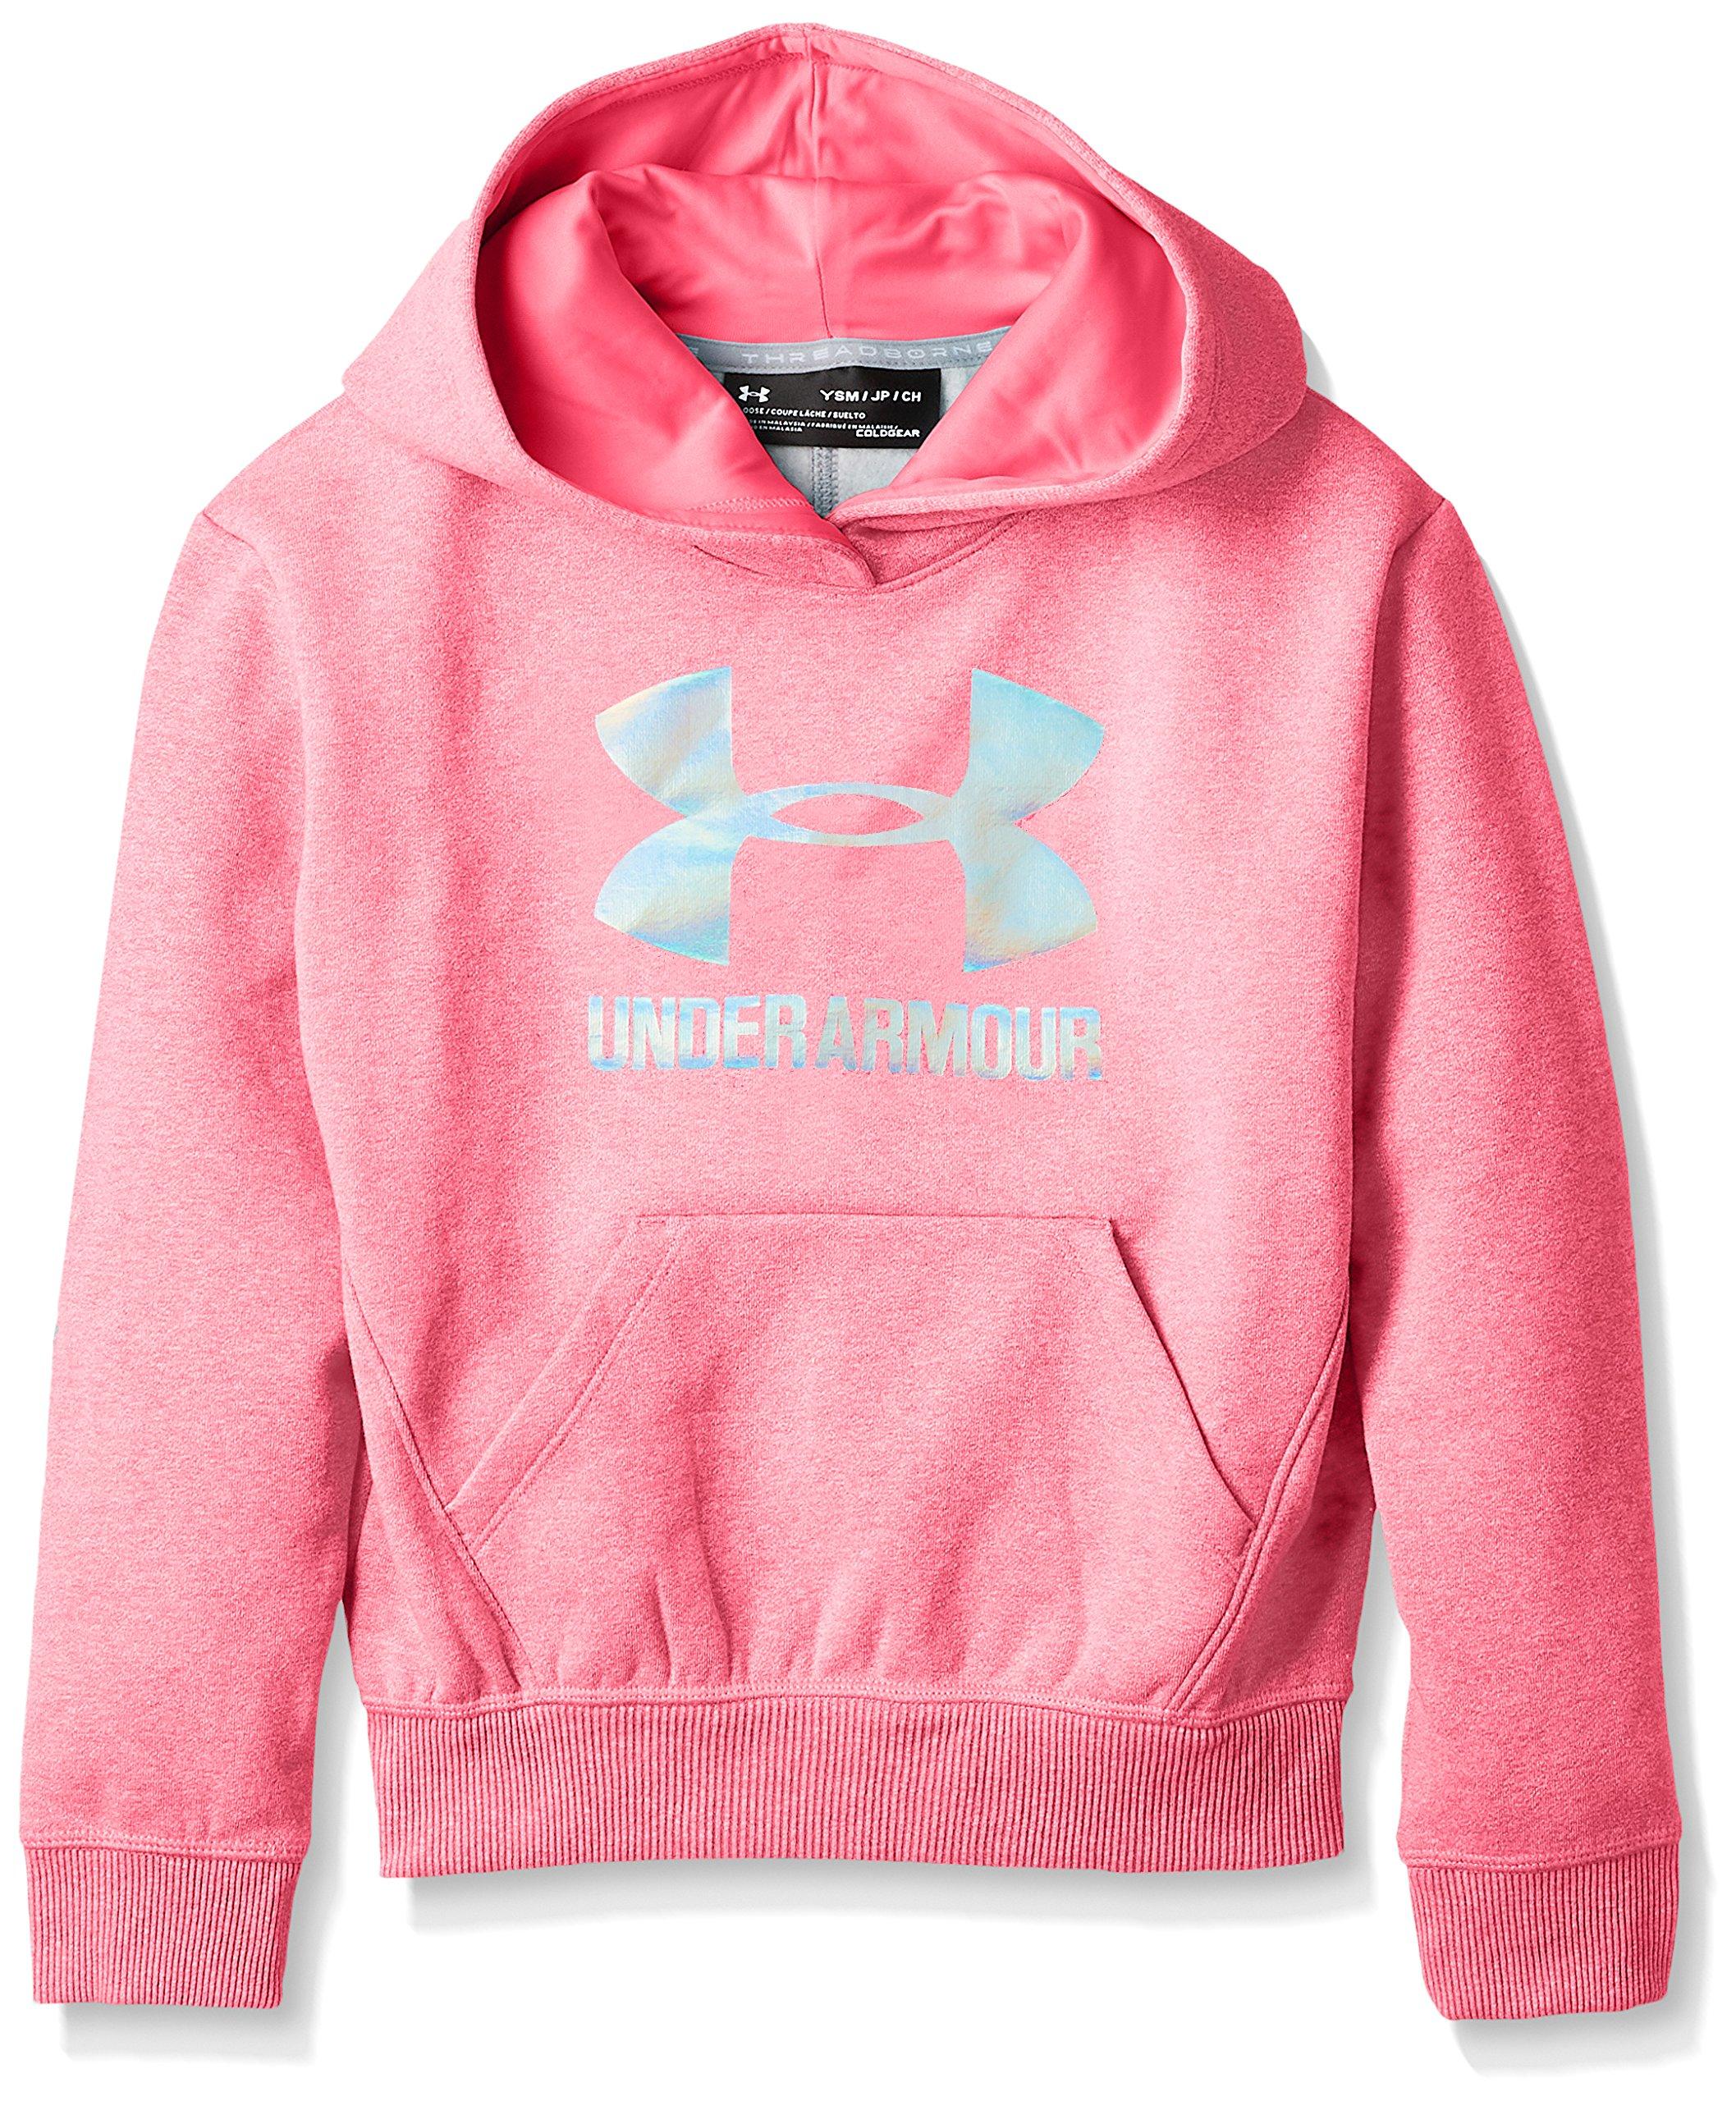 Under Armour Girls Threadborne Fleece Hoodie,Penta Pink /Silver, Youth X-Small